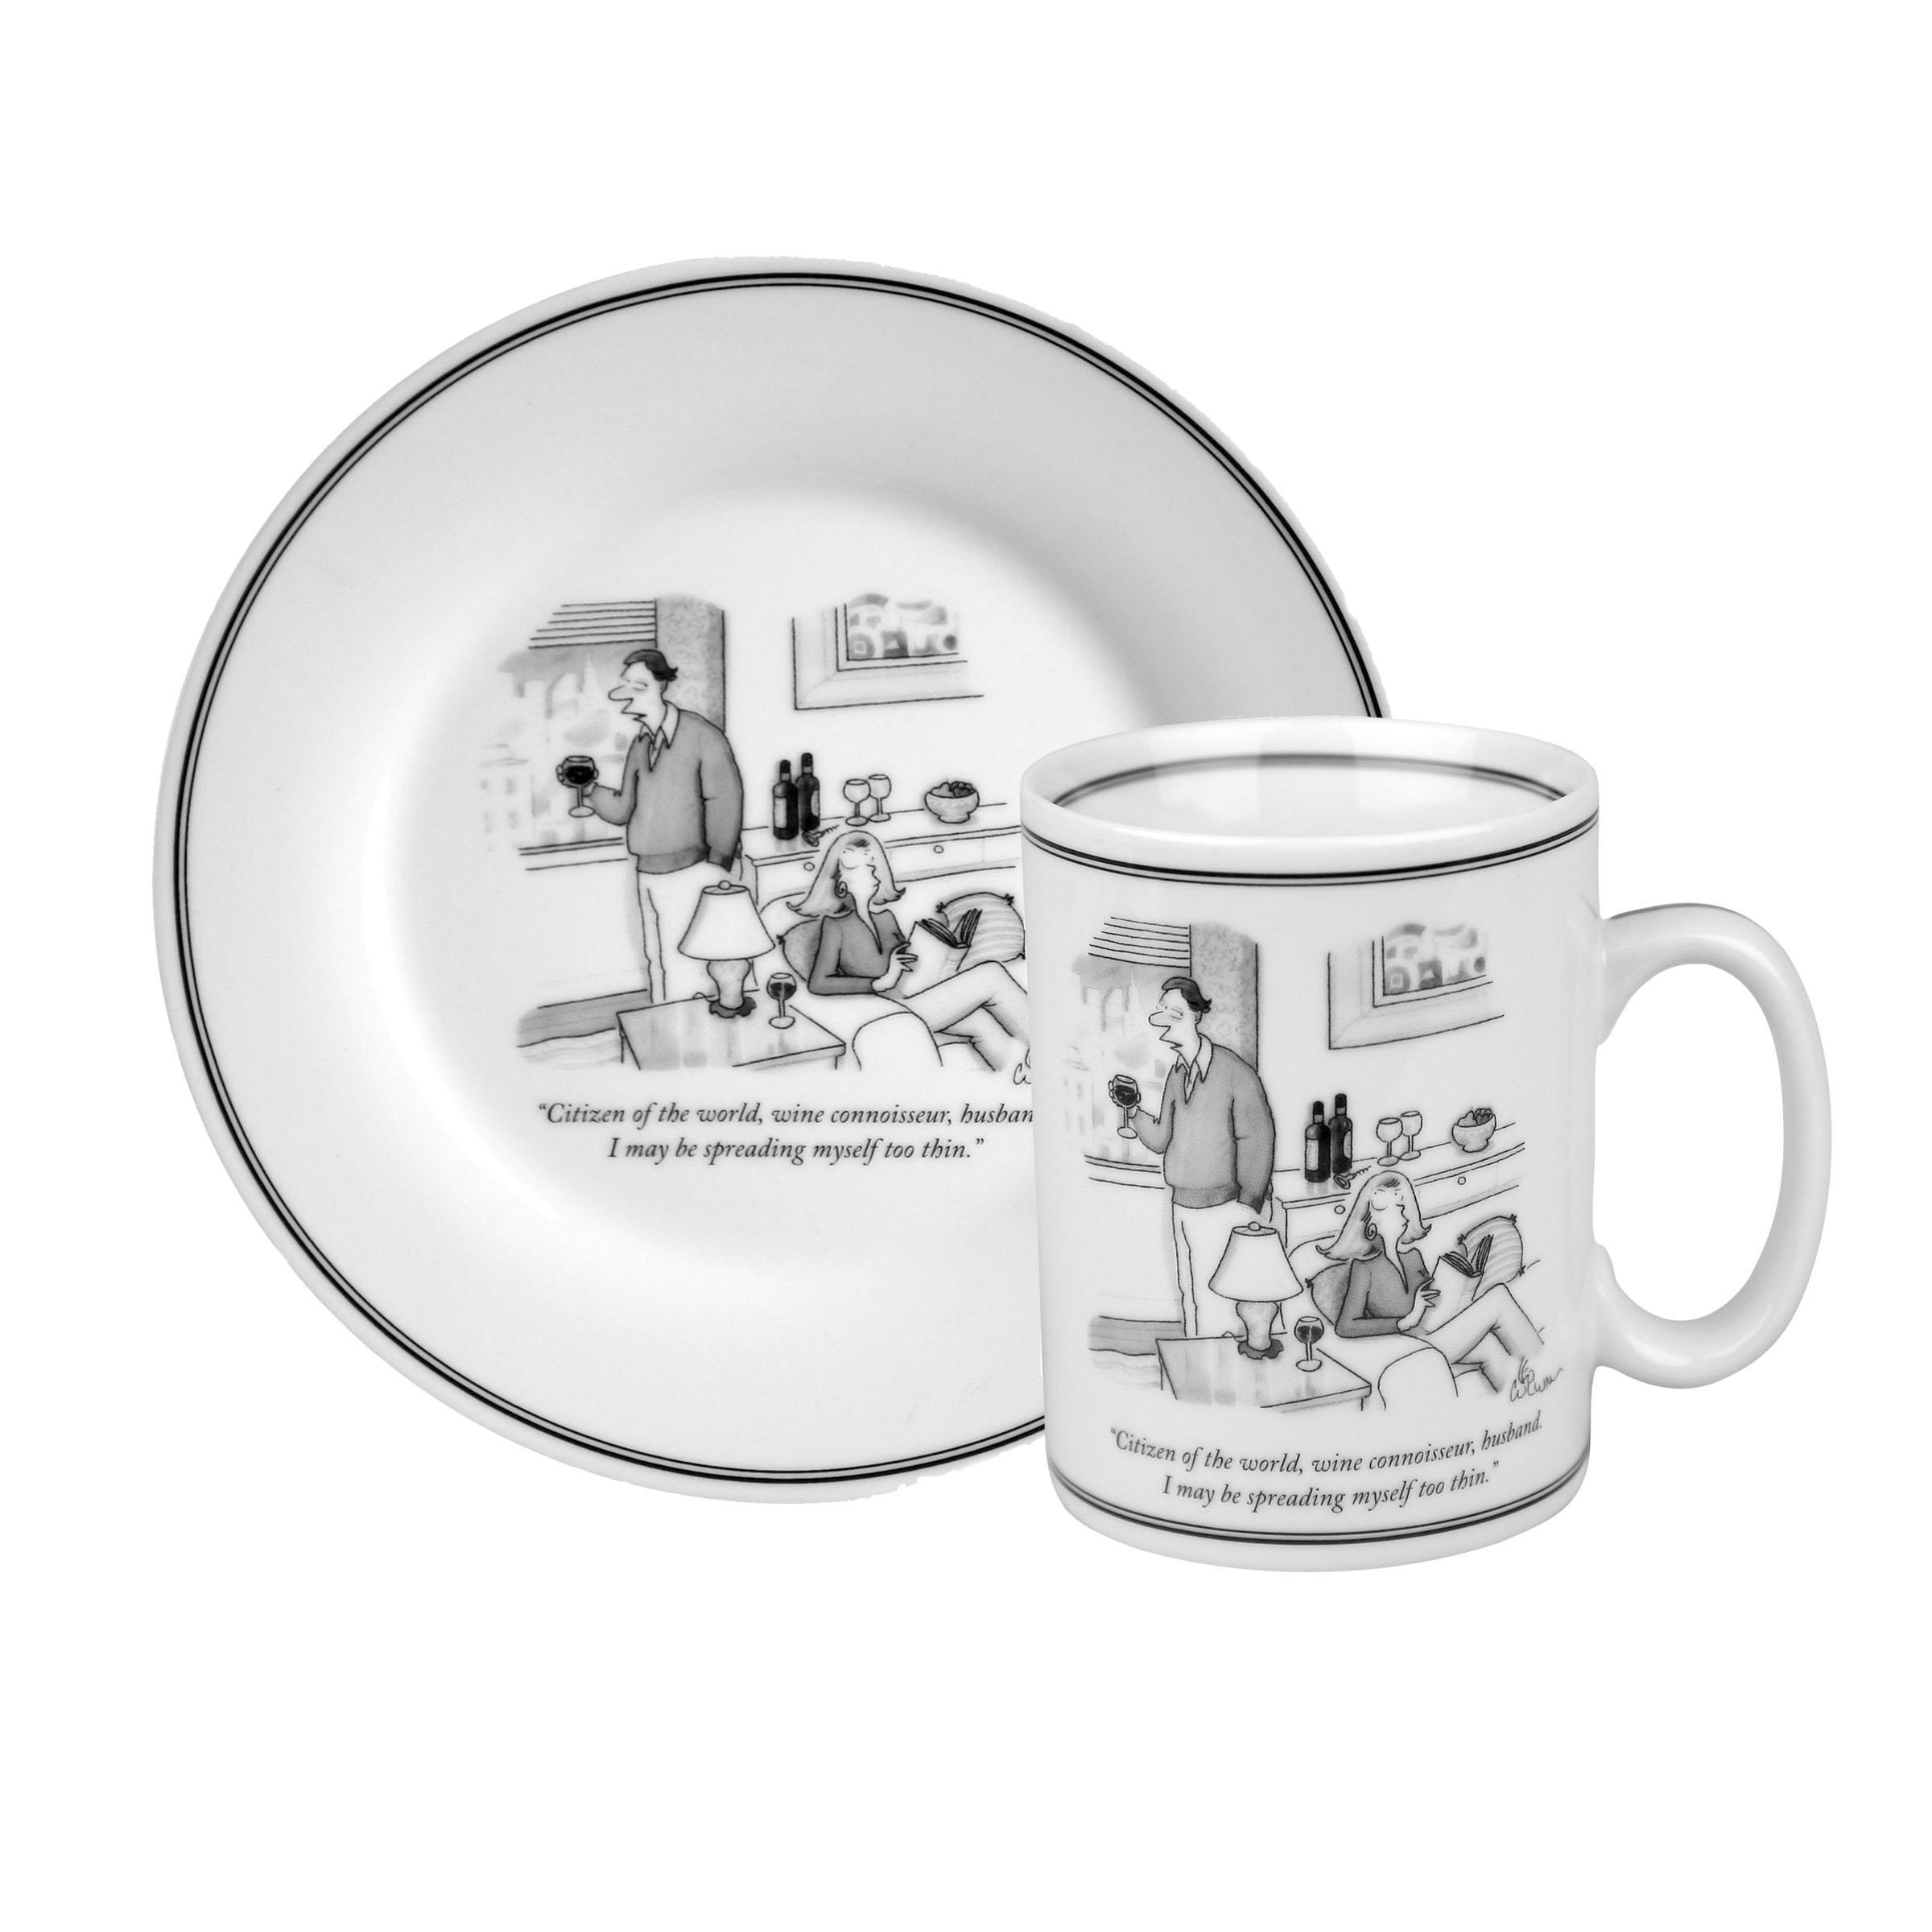 World' New Plate Collection Konitz Of And Set 'citizen Mug Yorker The uwXTOPikZ